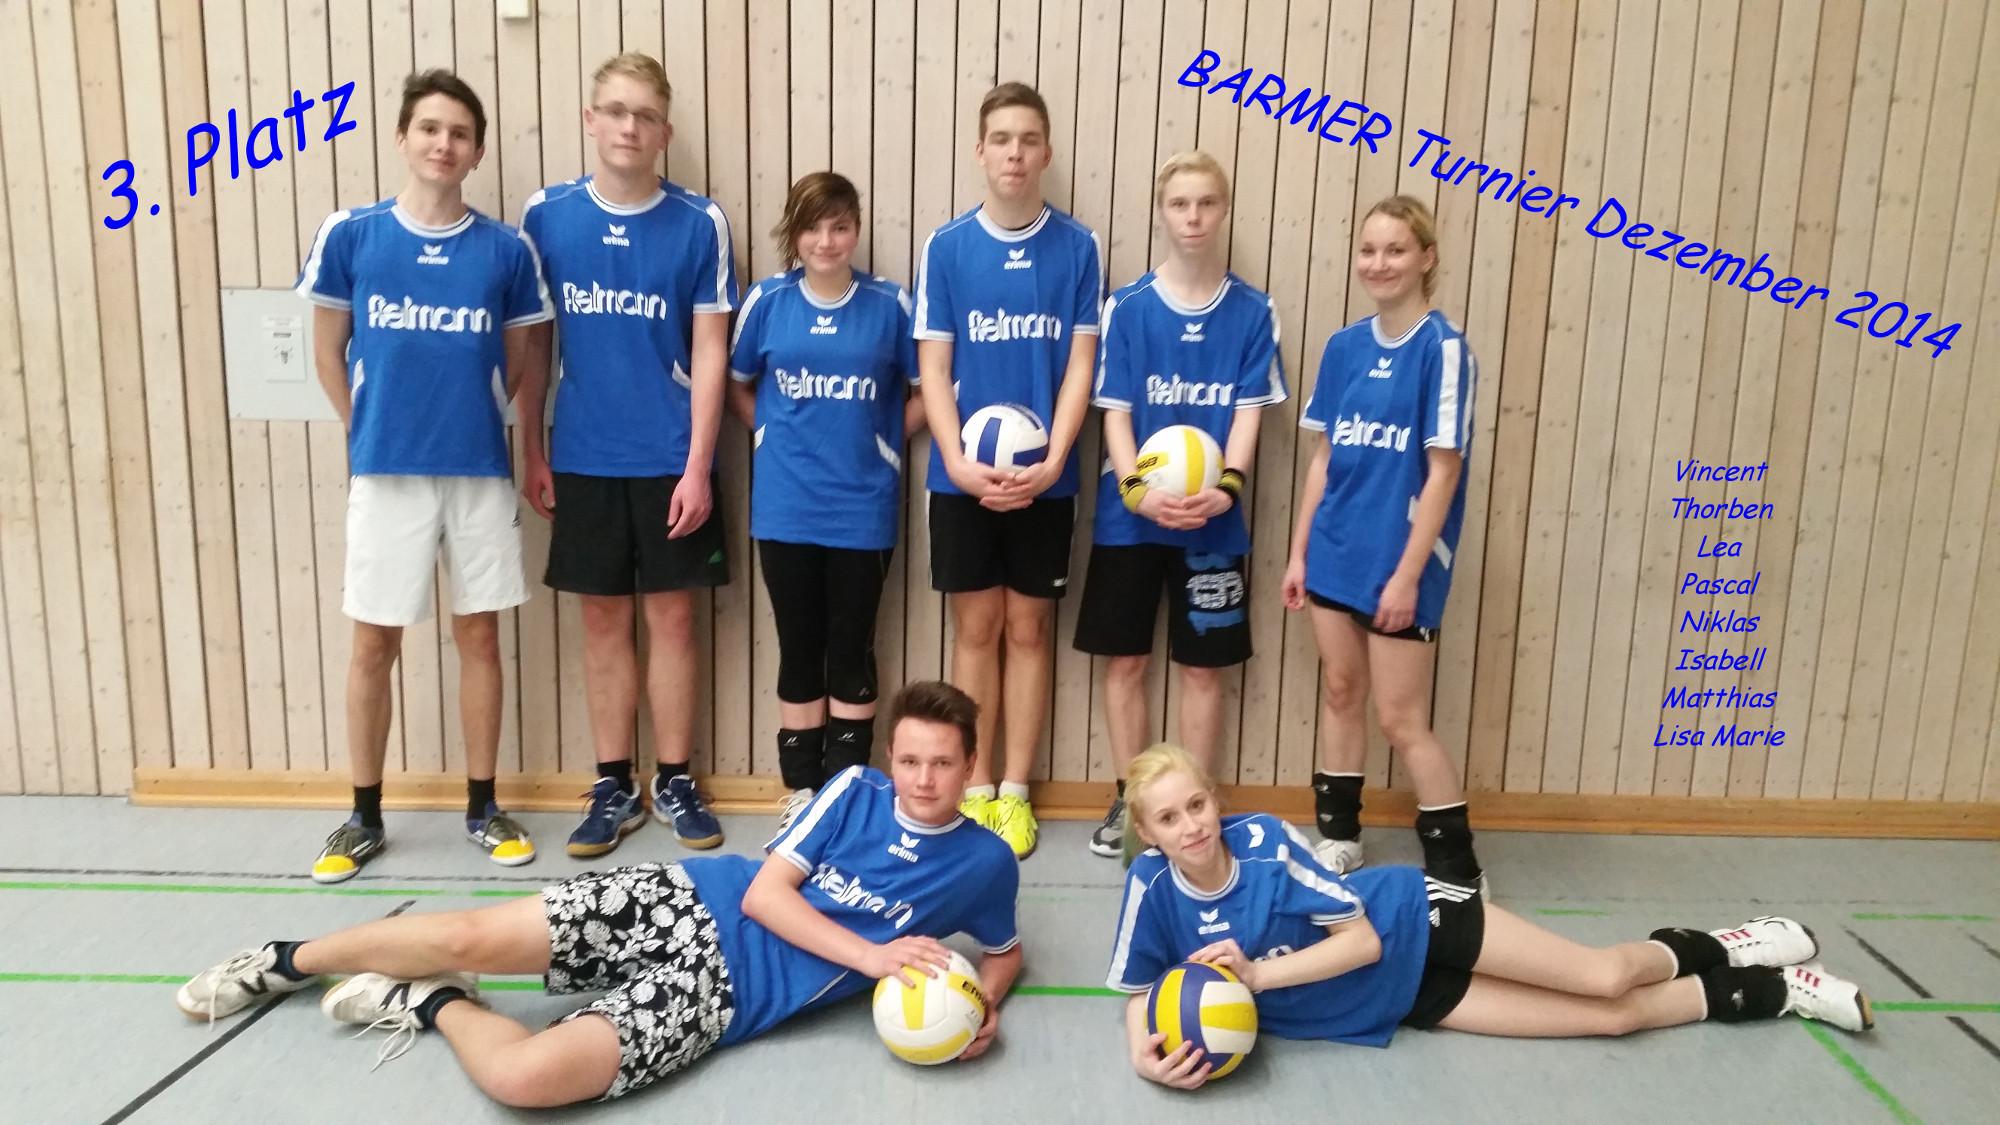 Volleyball Barmer 2014